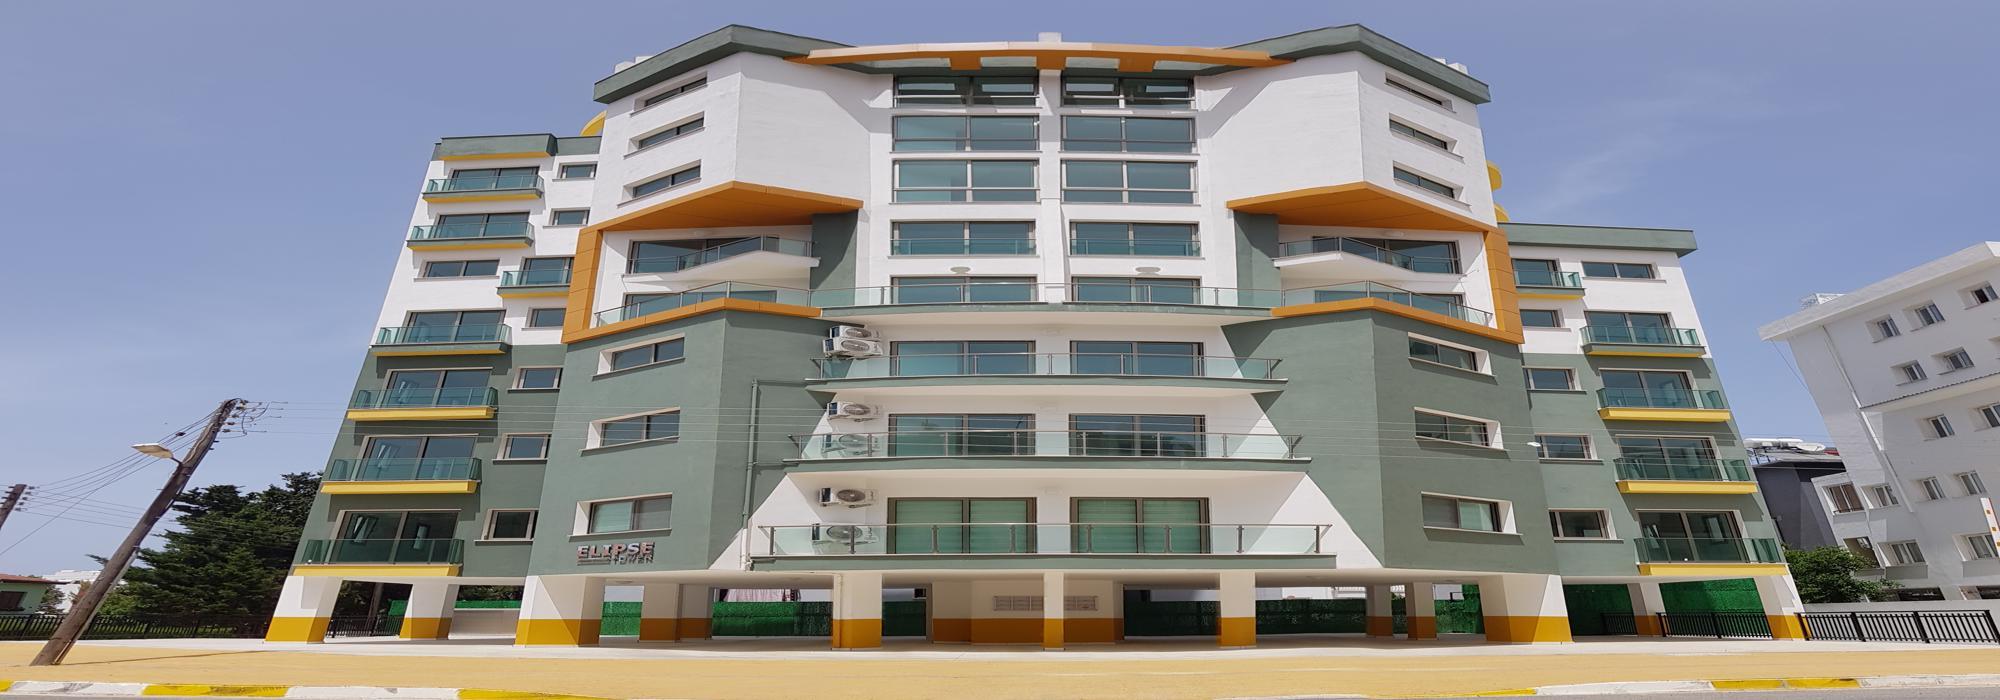 Bright 1 Bedroom Apartment For Sale Location Near Barish Park Wednesday Market Girne